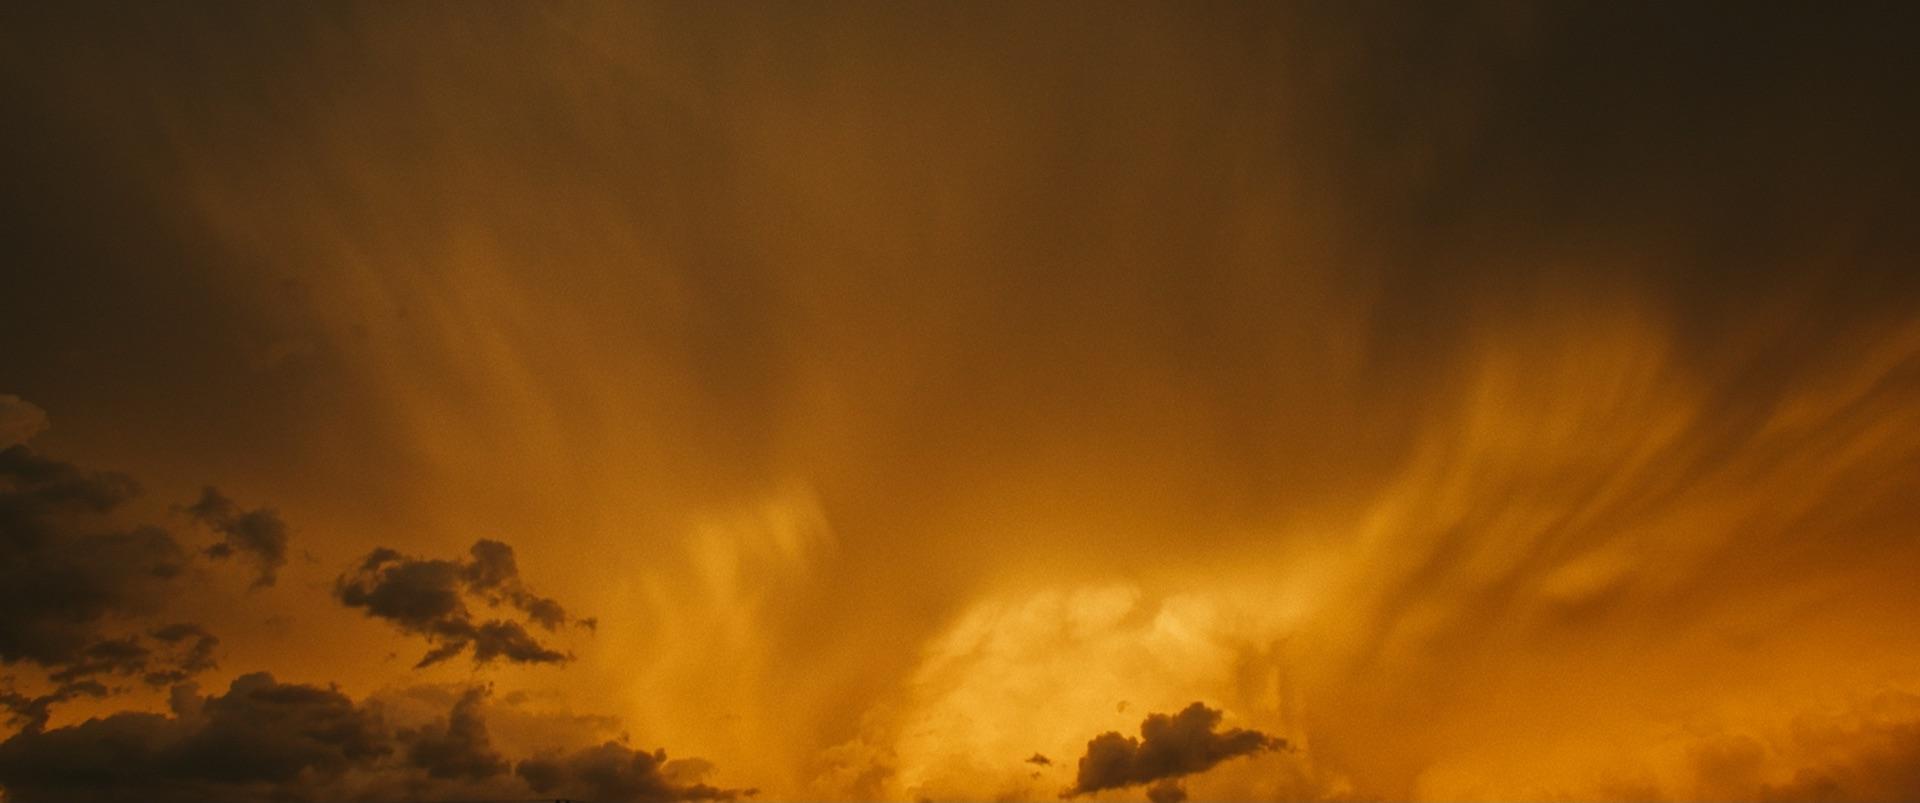 The Last Storm_1.2.1.jpg